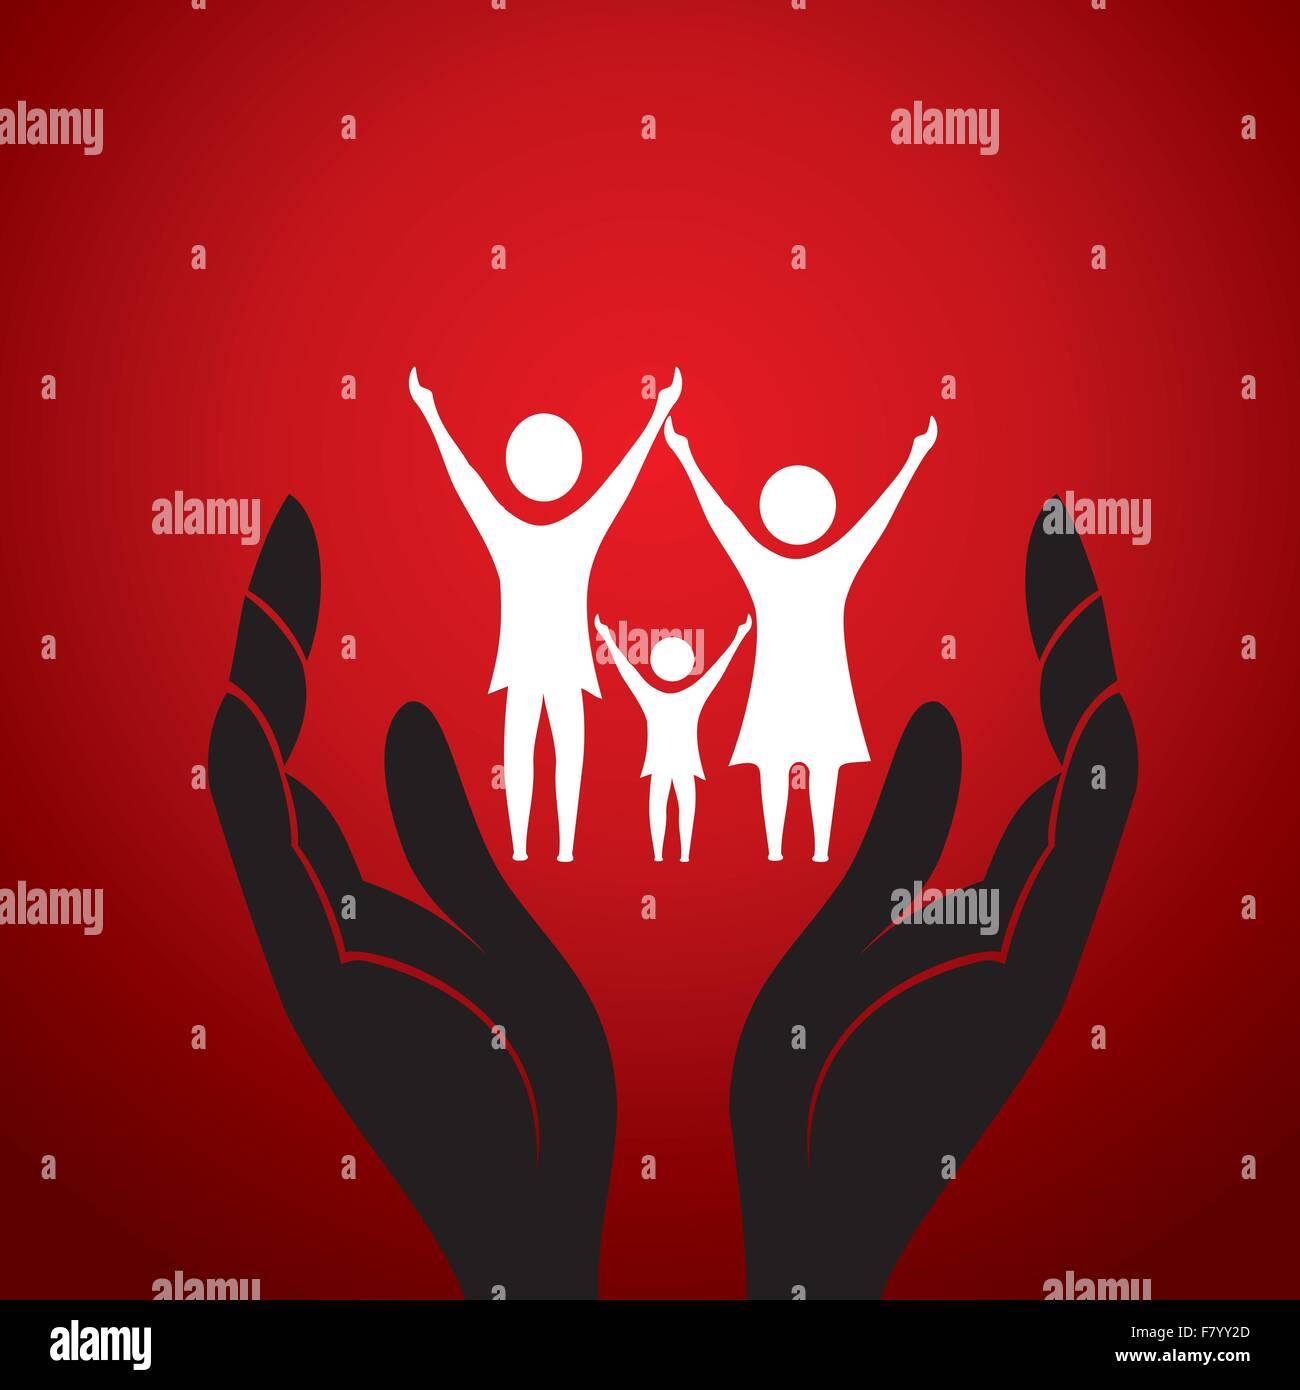 Con la familia en la mano Imagen De Stock